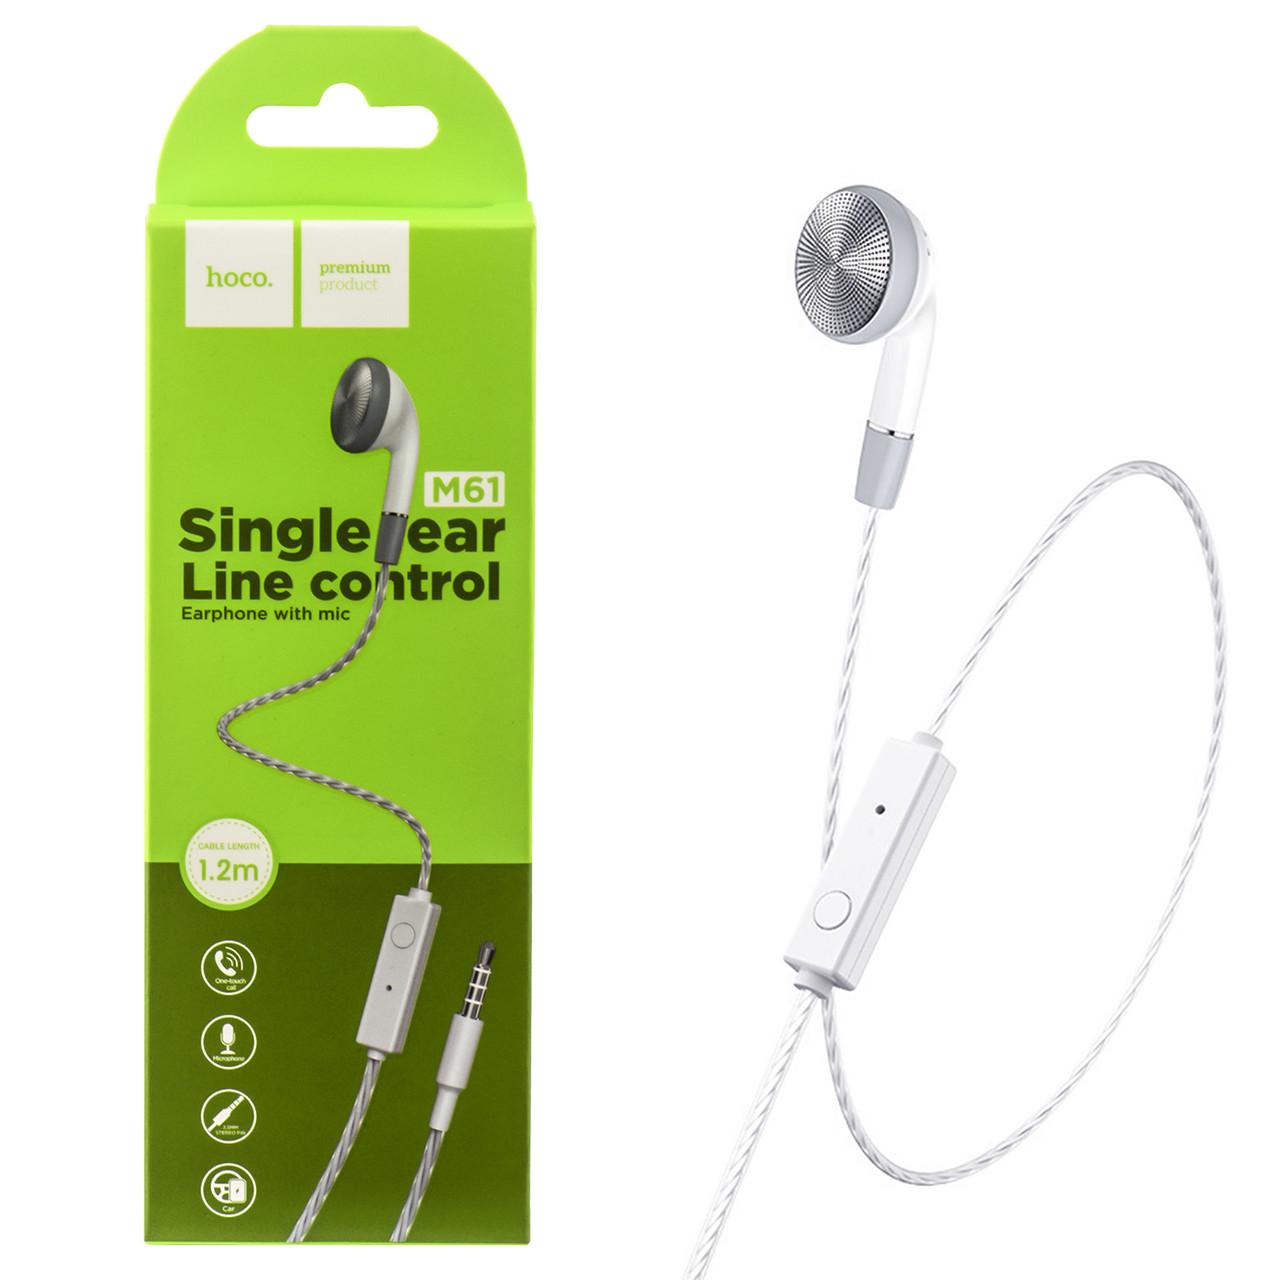 Гарнитура Hoco M61 Single Ear Line Control, White